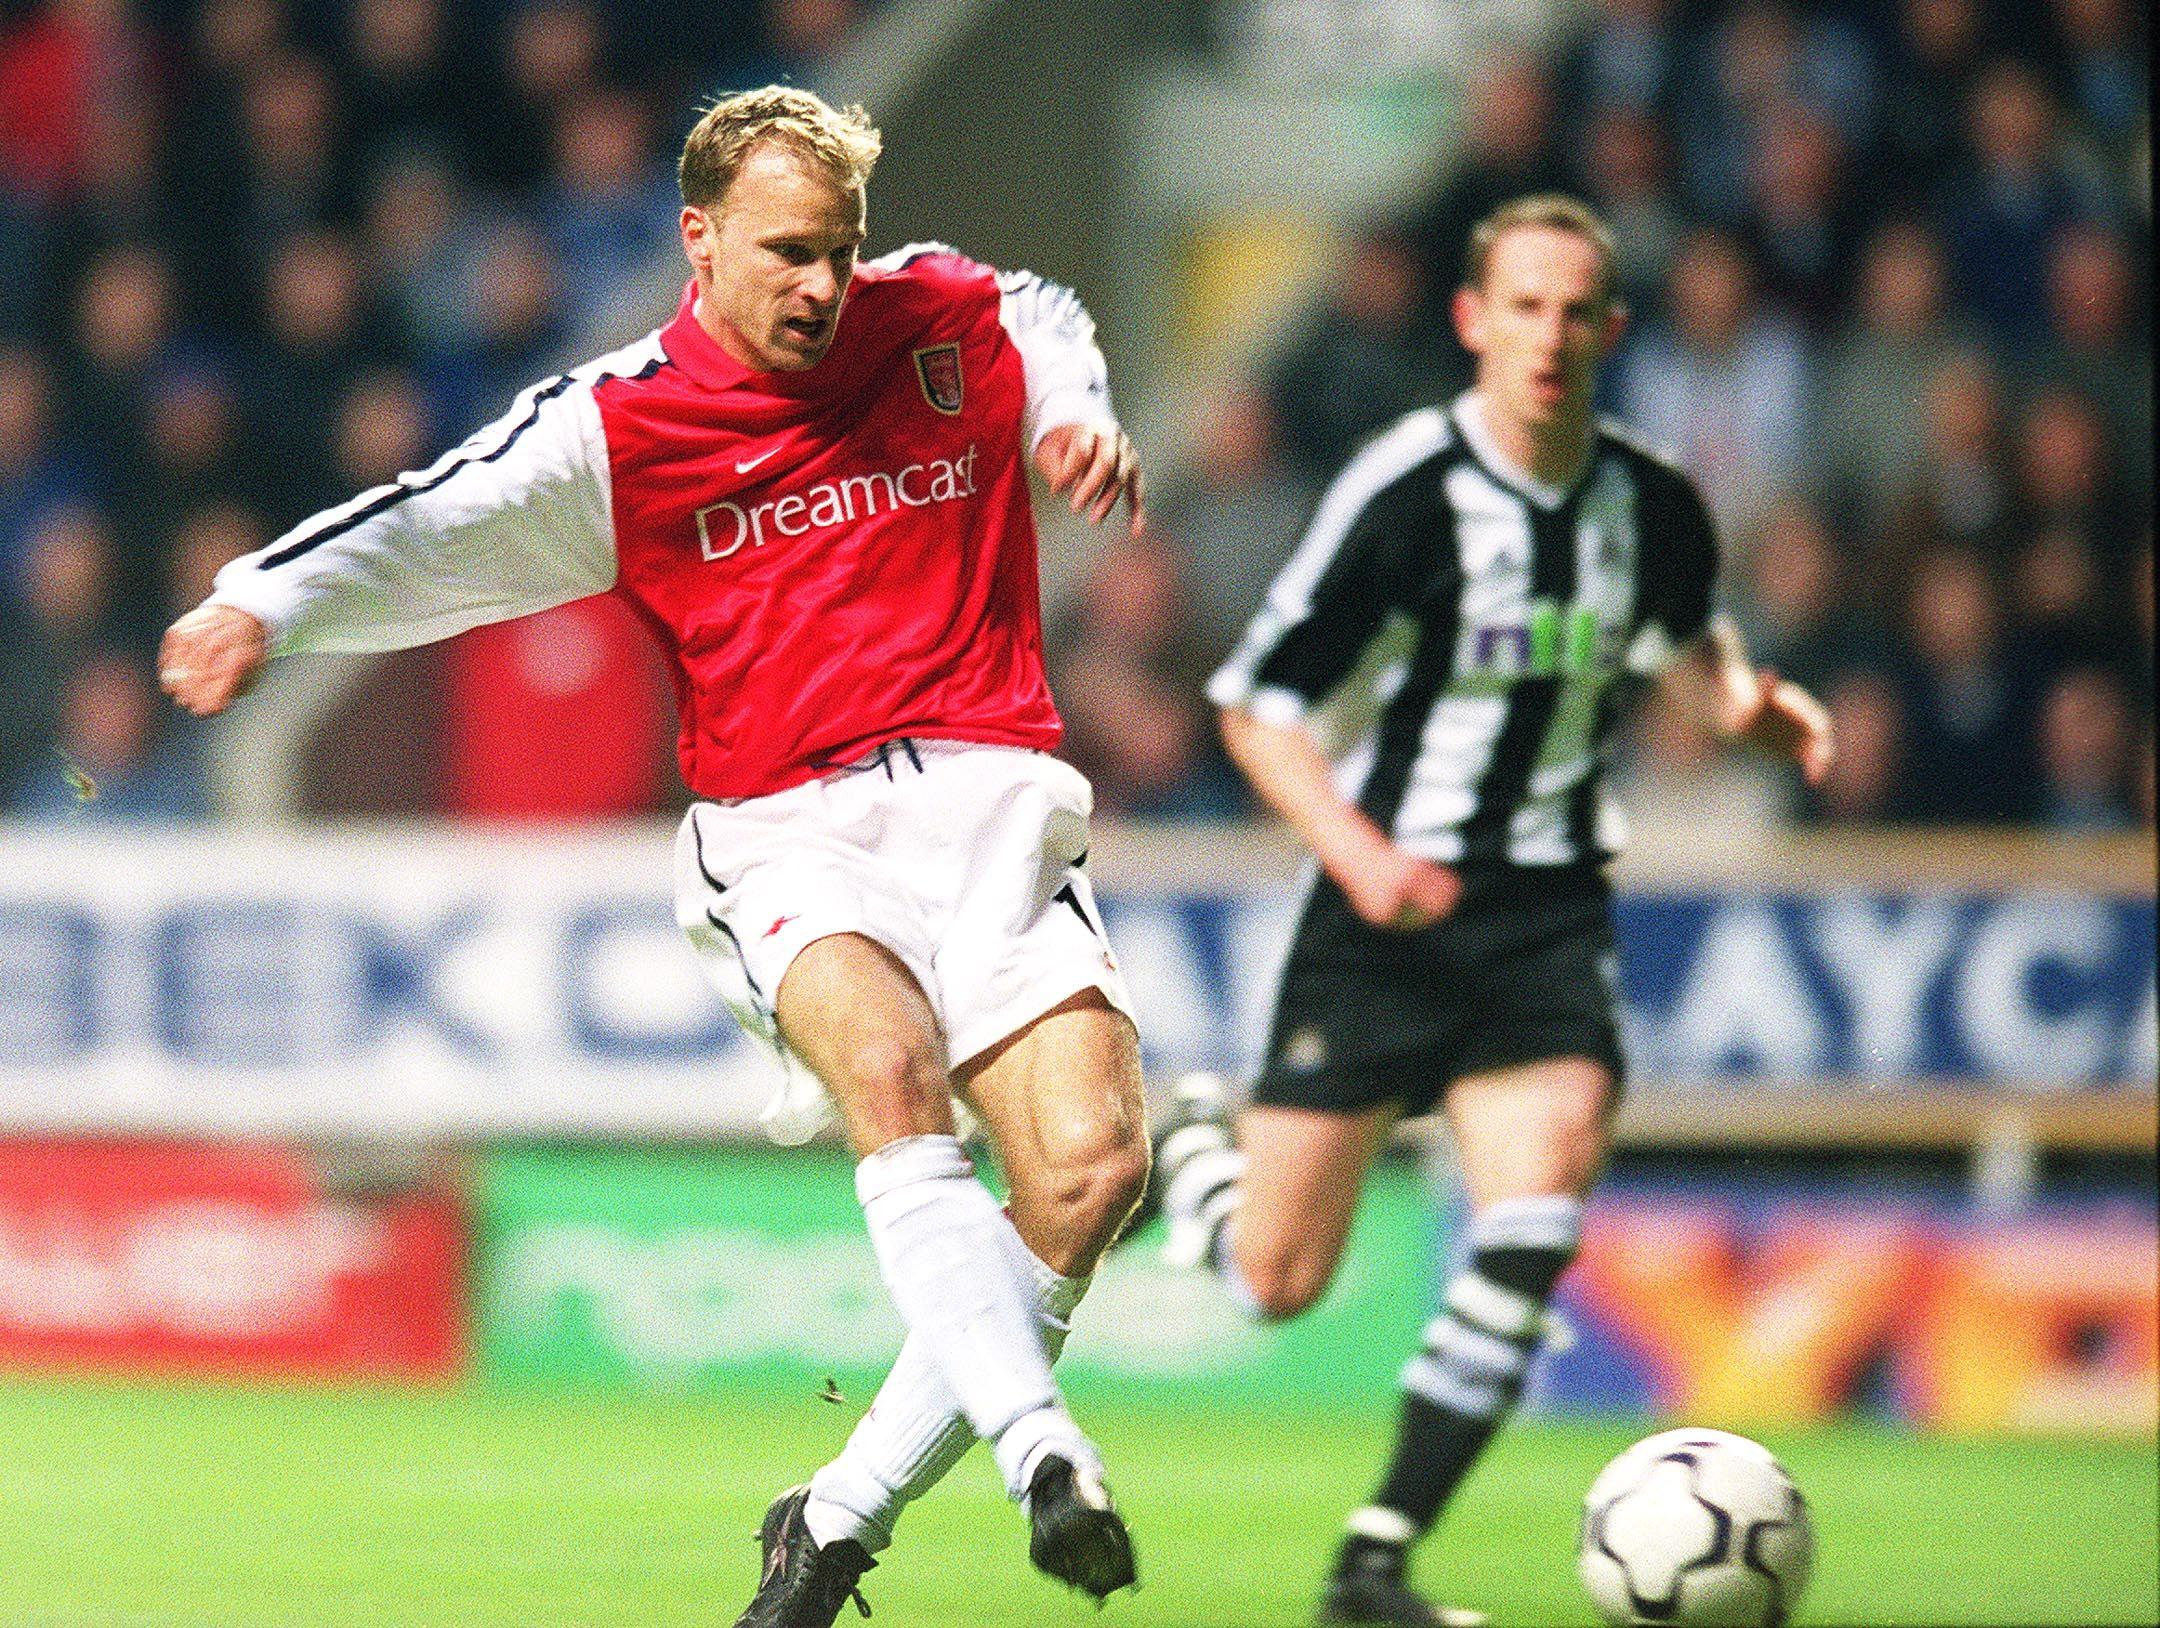 Forward Dennis Bergkamp